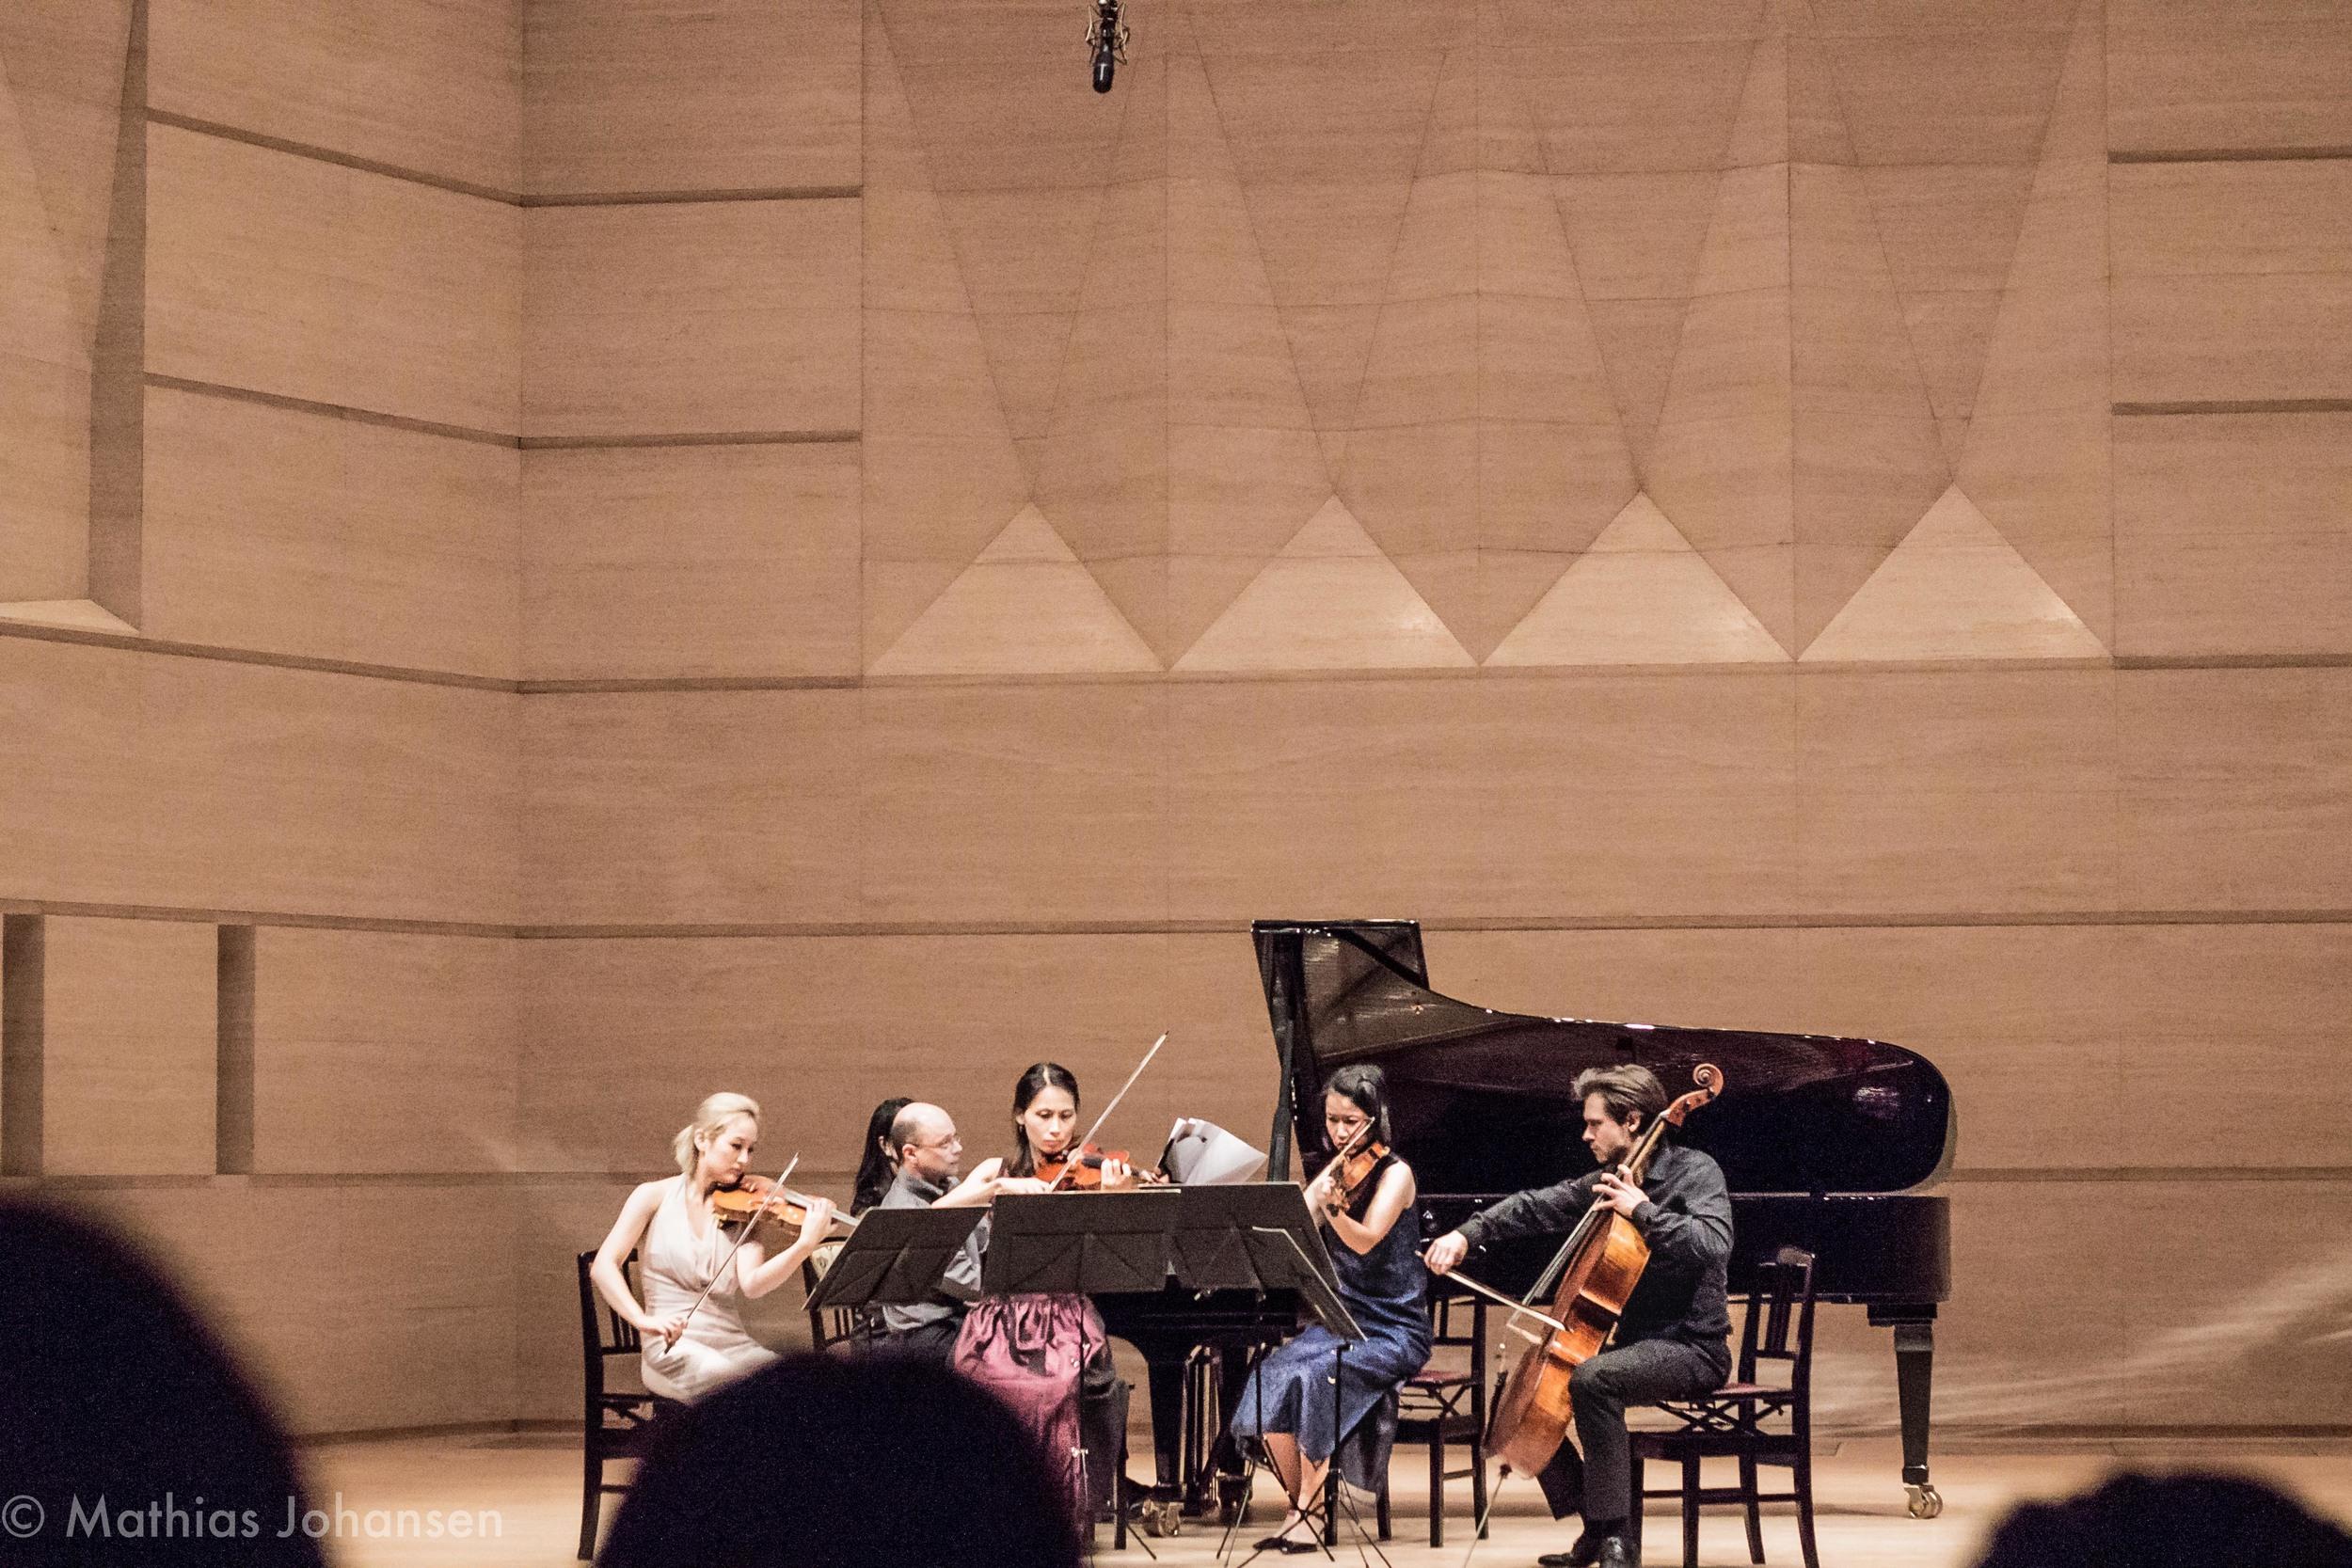 Masters Concert in Nagoya #5